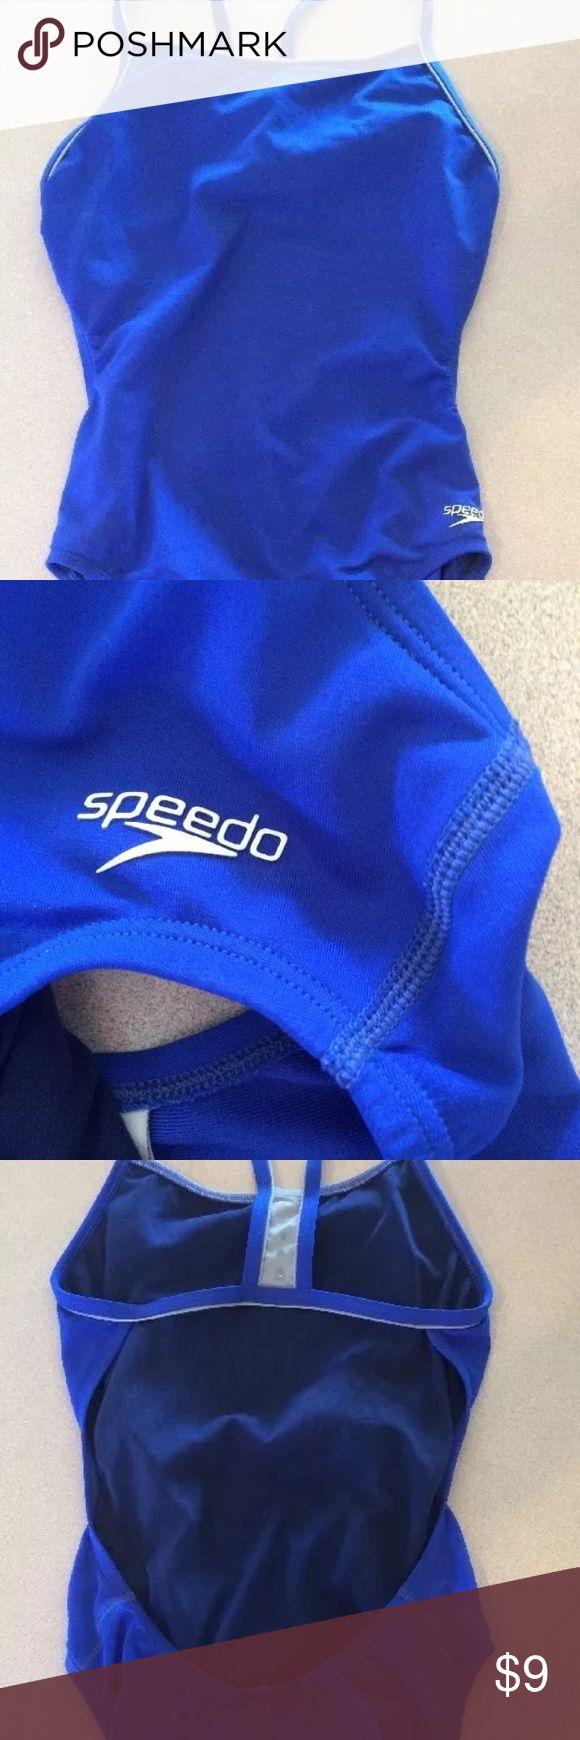 Speedo blue one piece swimsuit size 6 Speedo swimsuit one piece blue size 6 Speedo Swim One Pieces